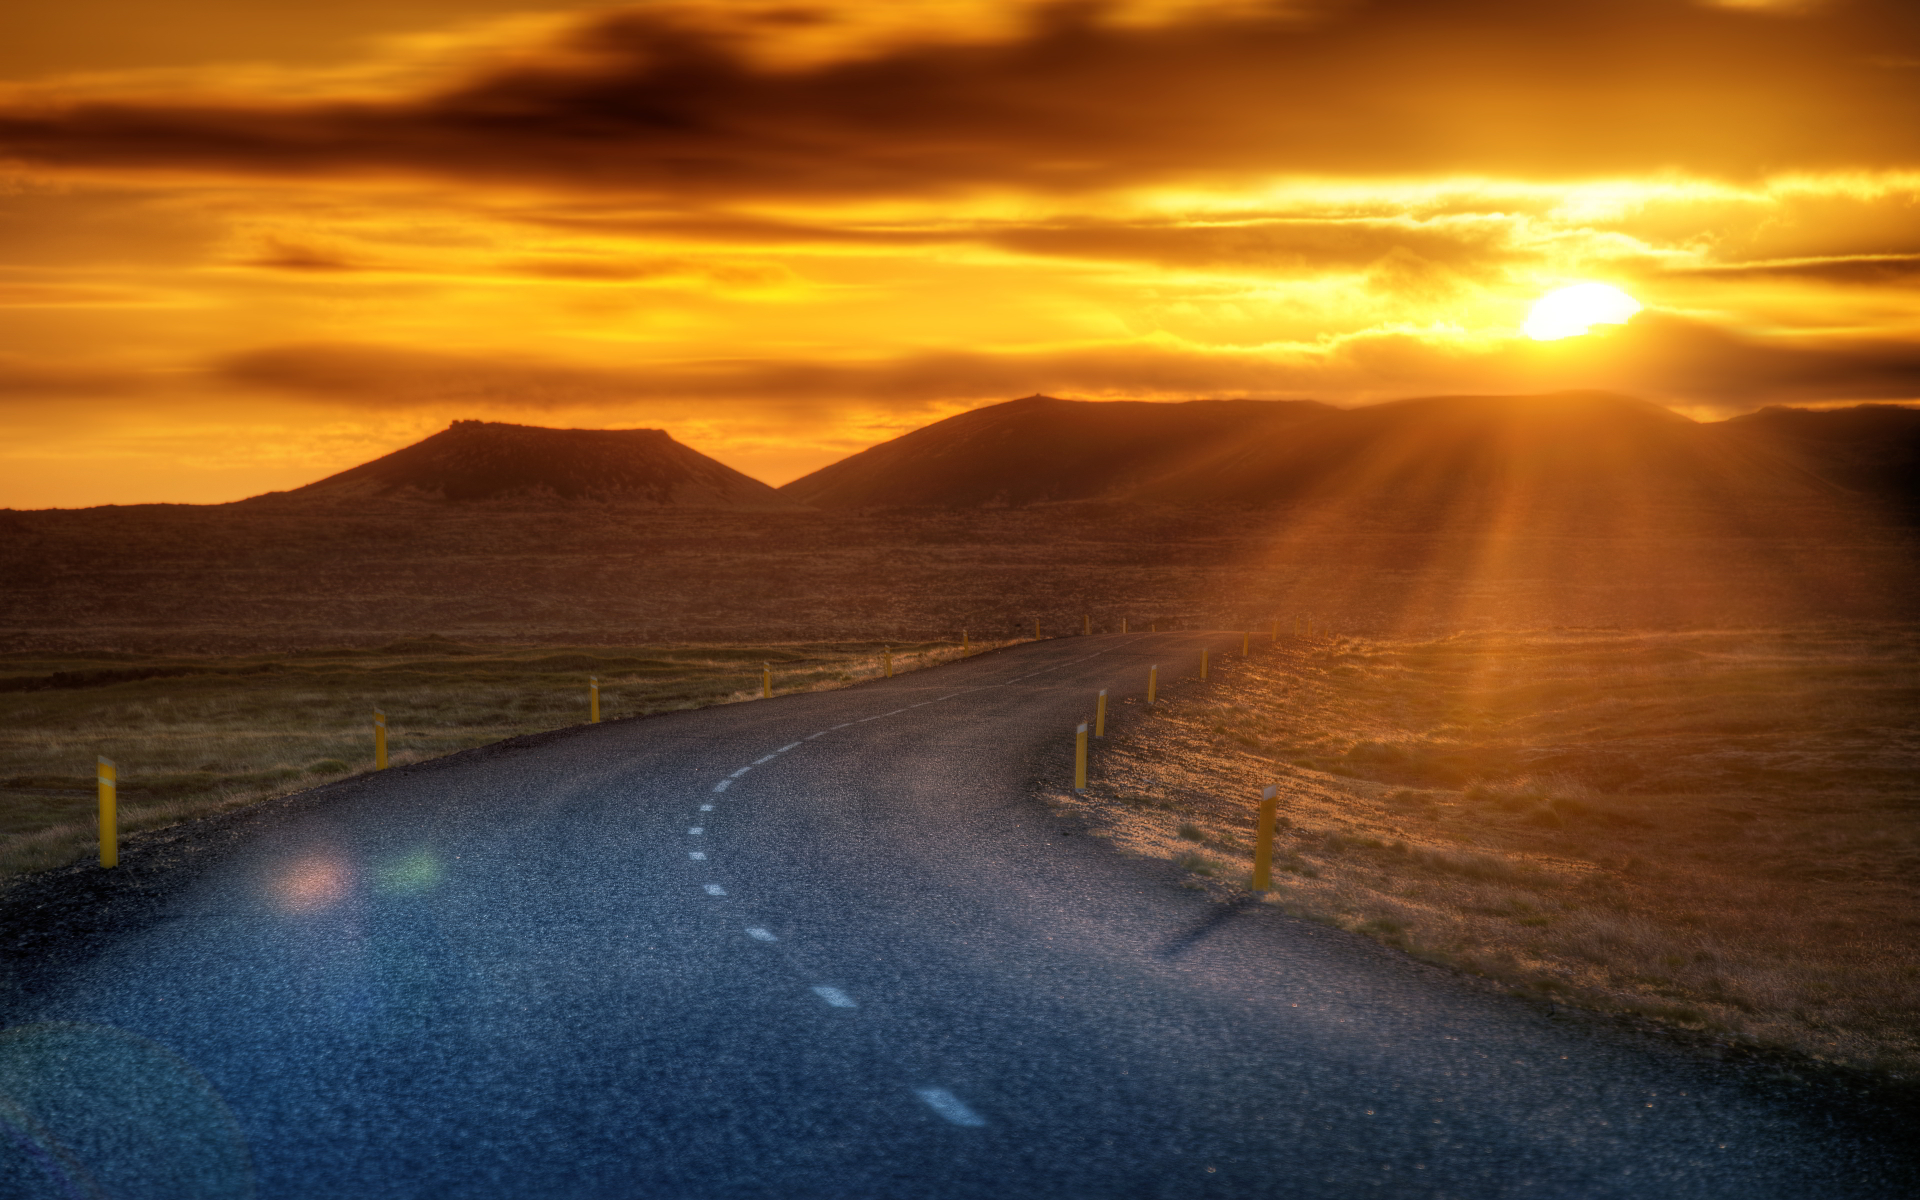 mountain sunset wallpaper nature